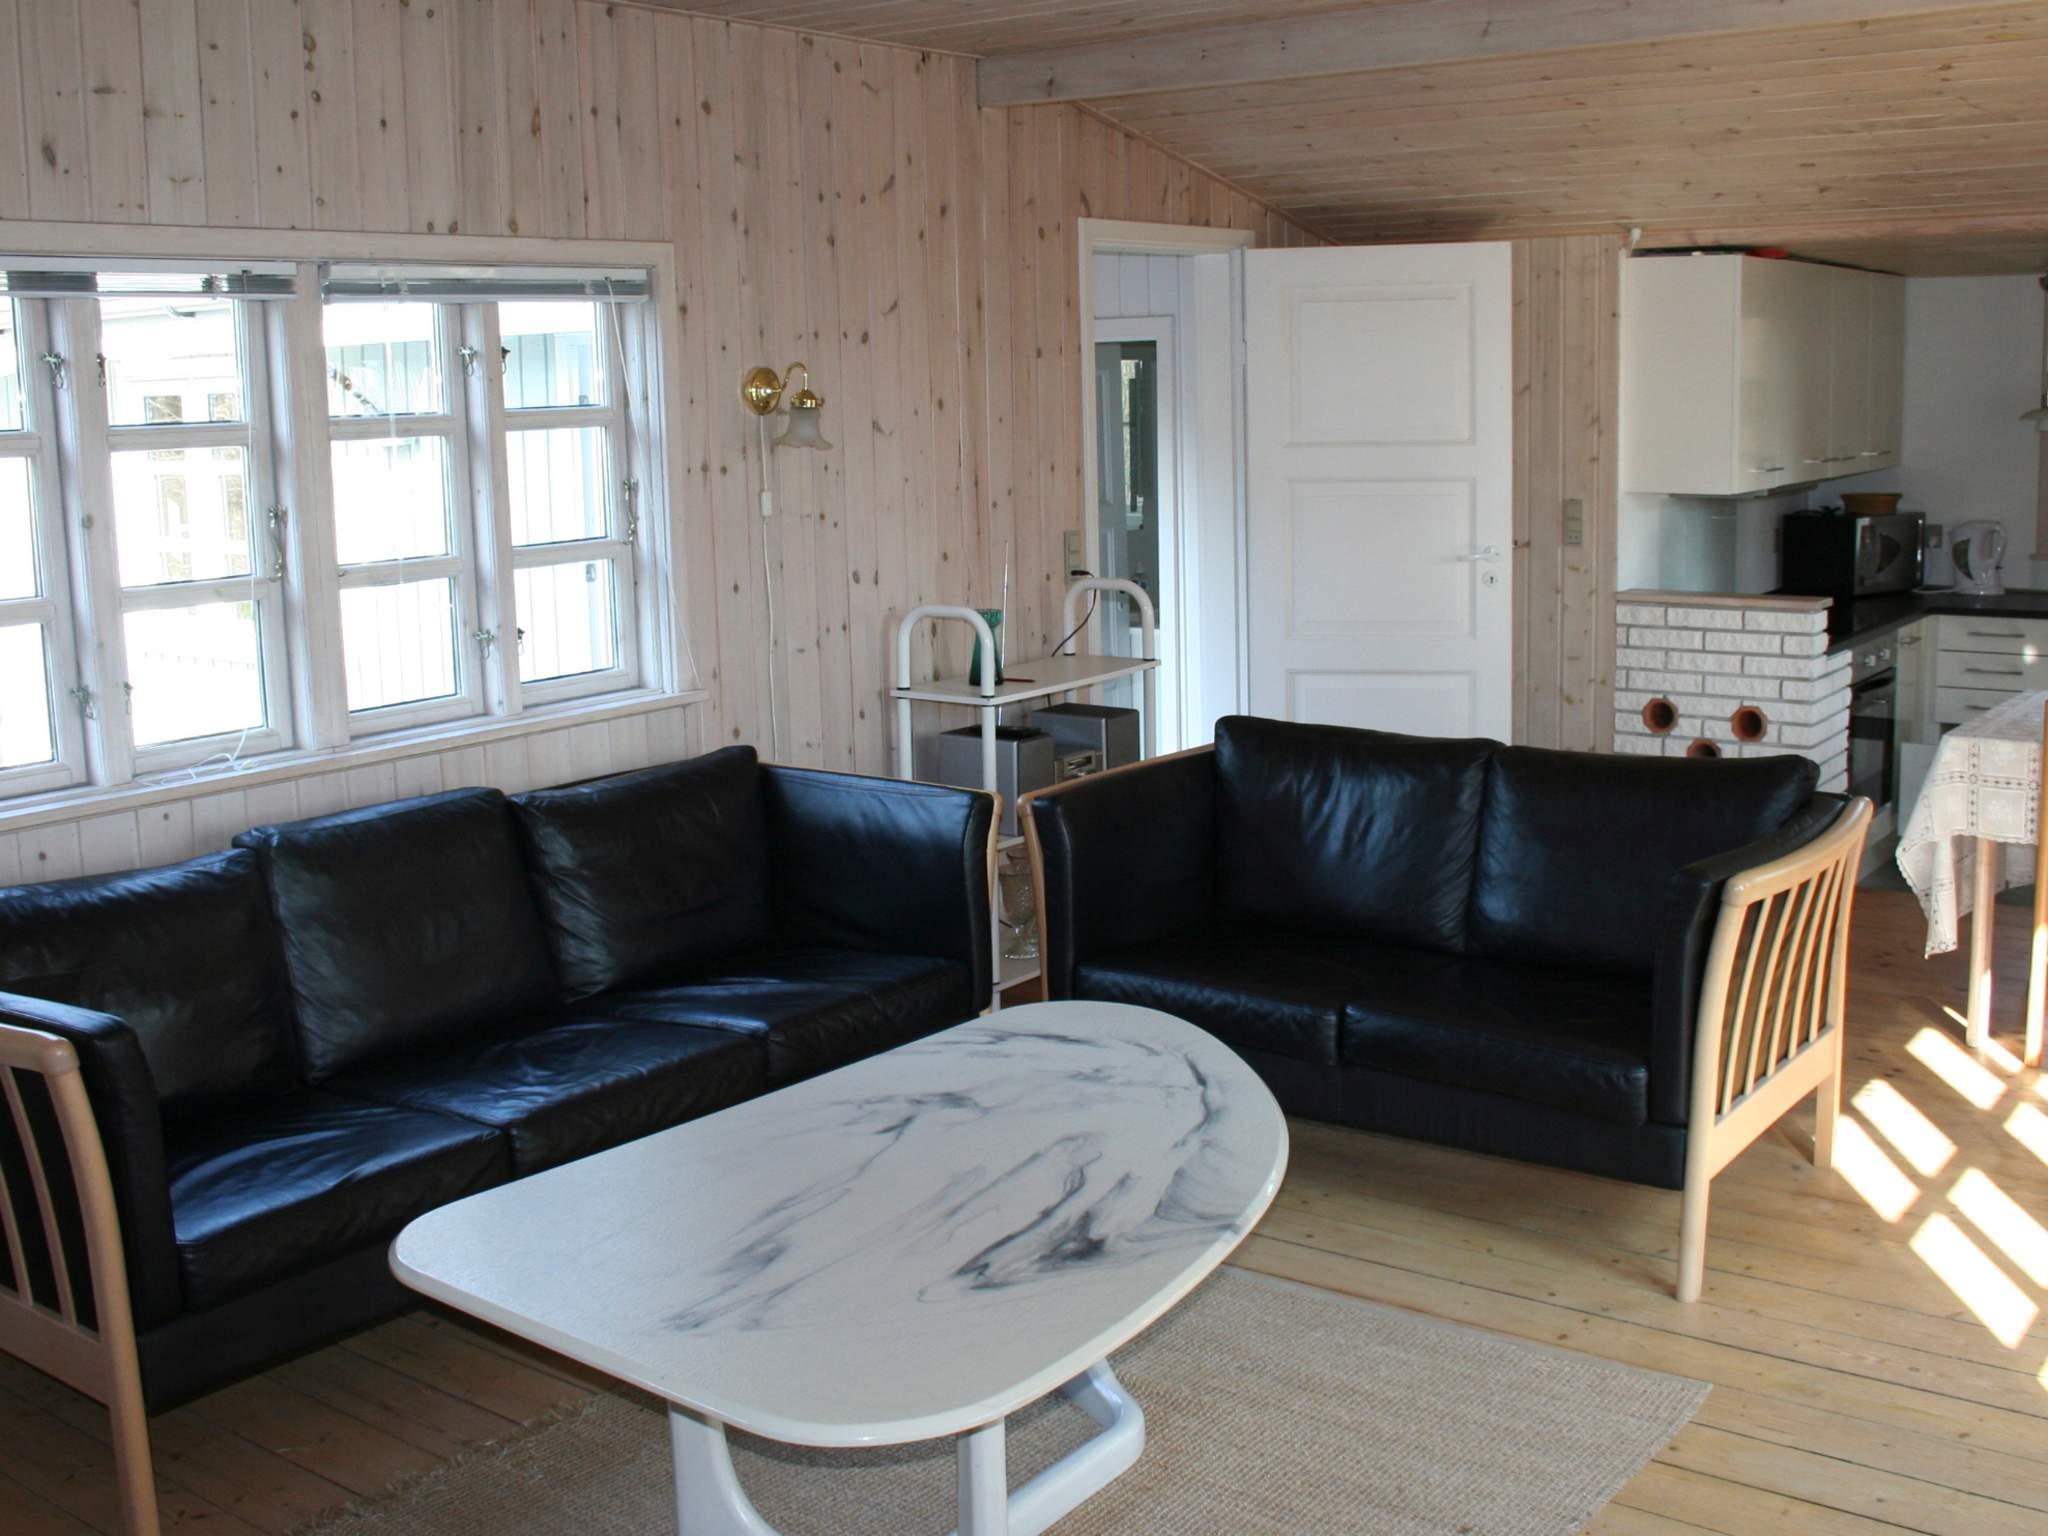 Ferienhaus Balka Strand (493388), Balke, , Bornholm, Dänemark, Bild 12